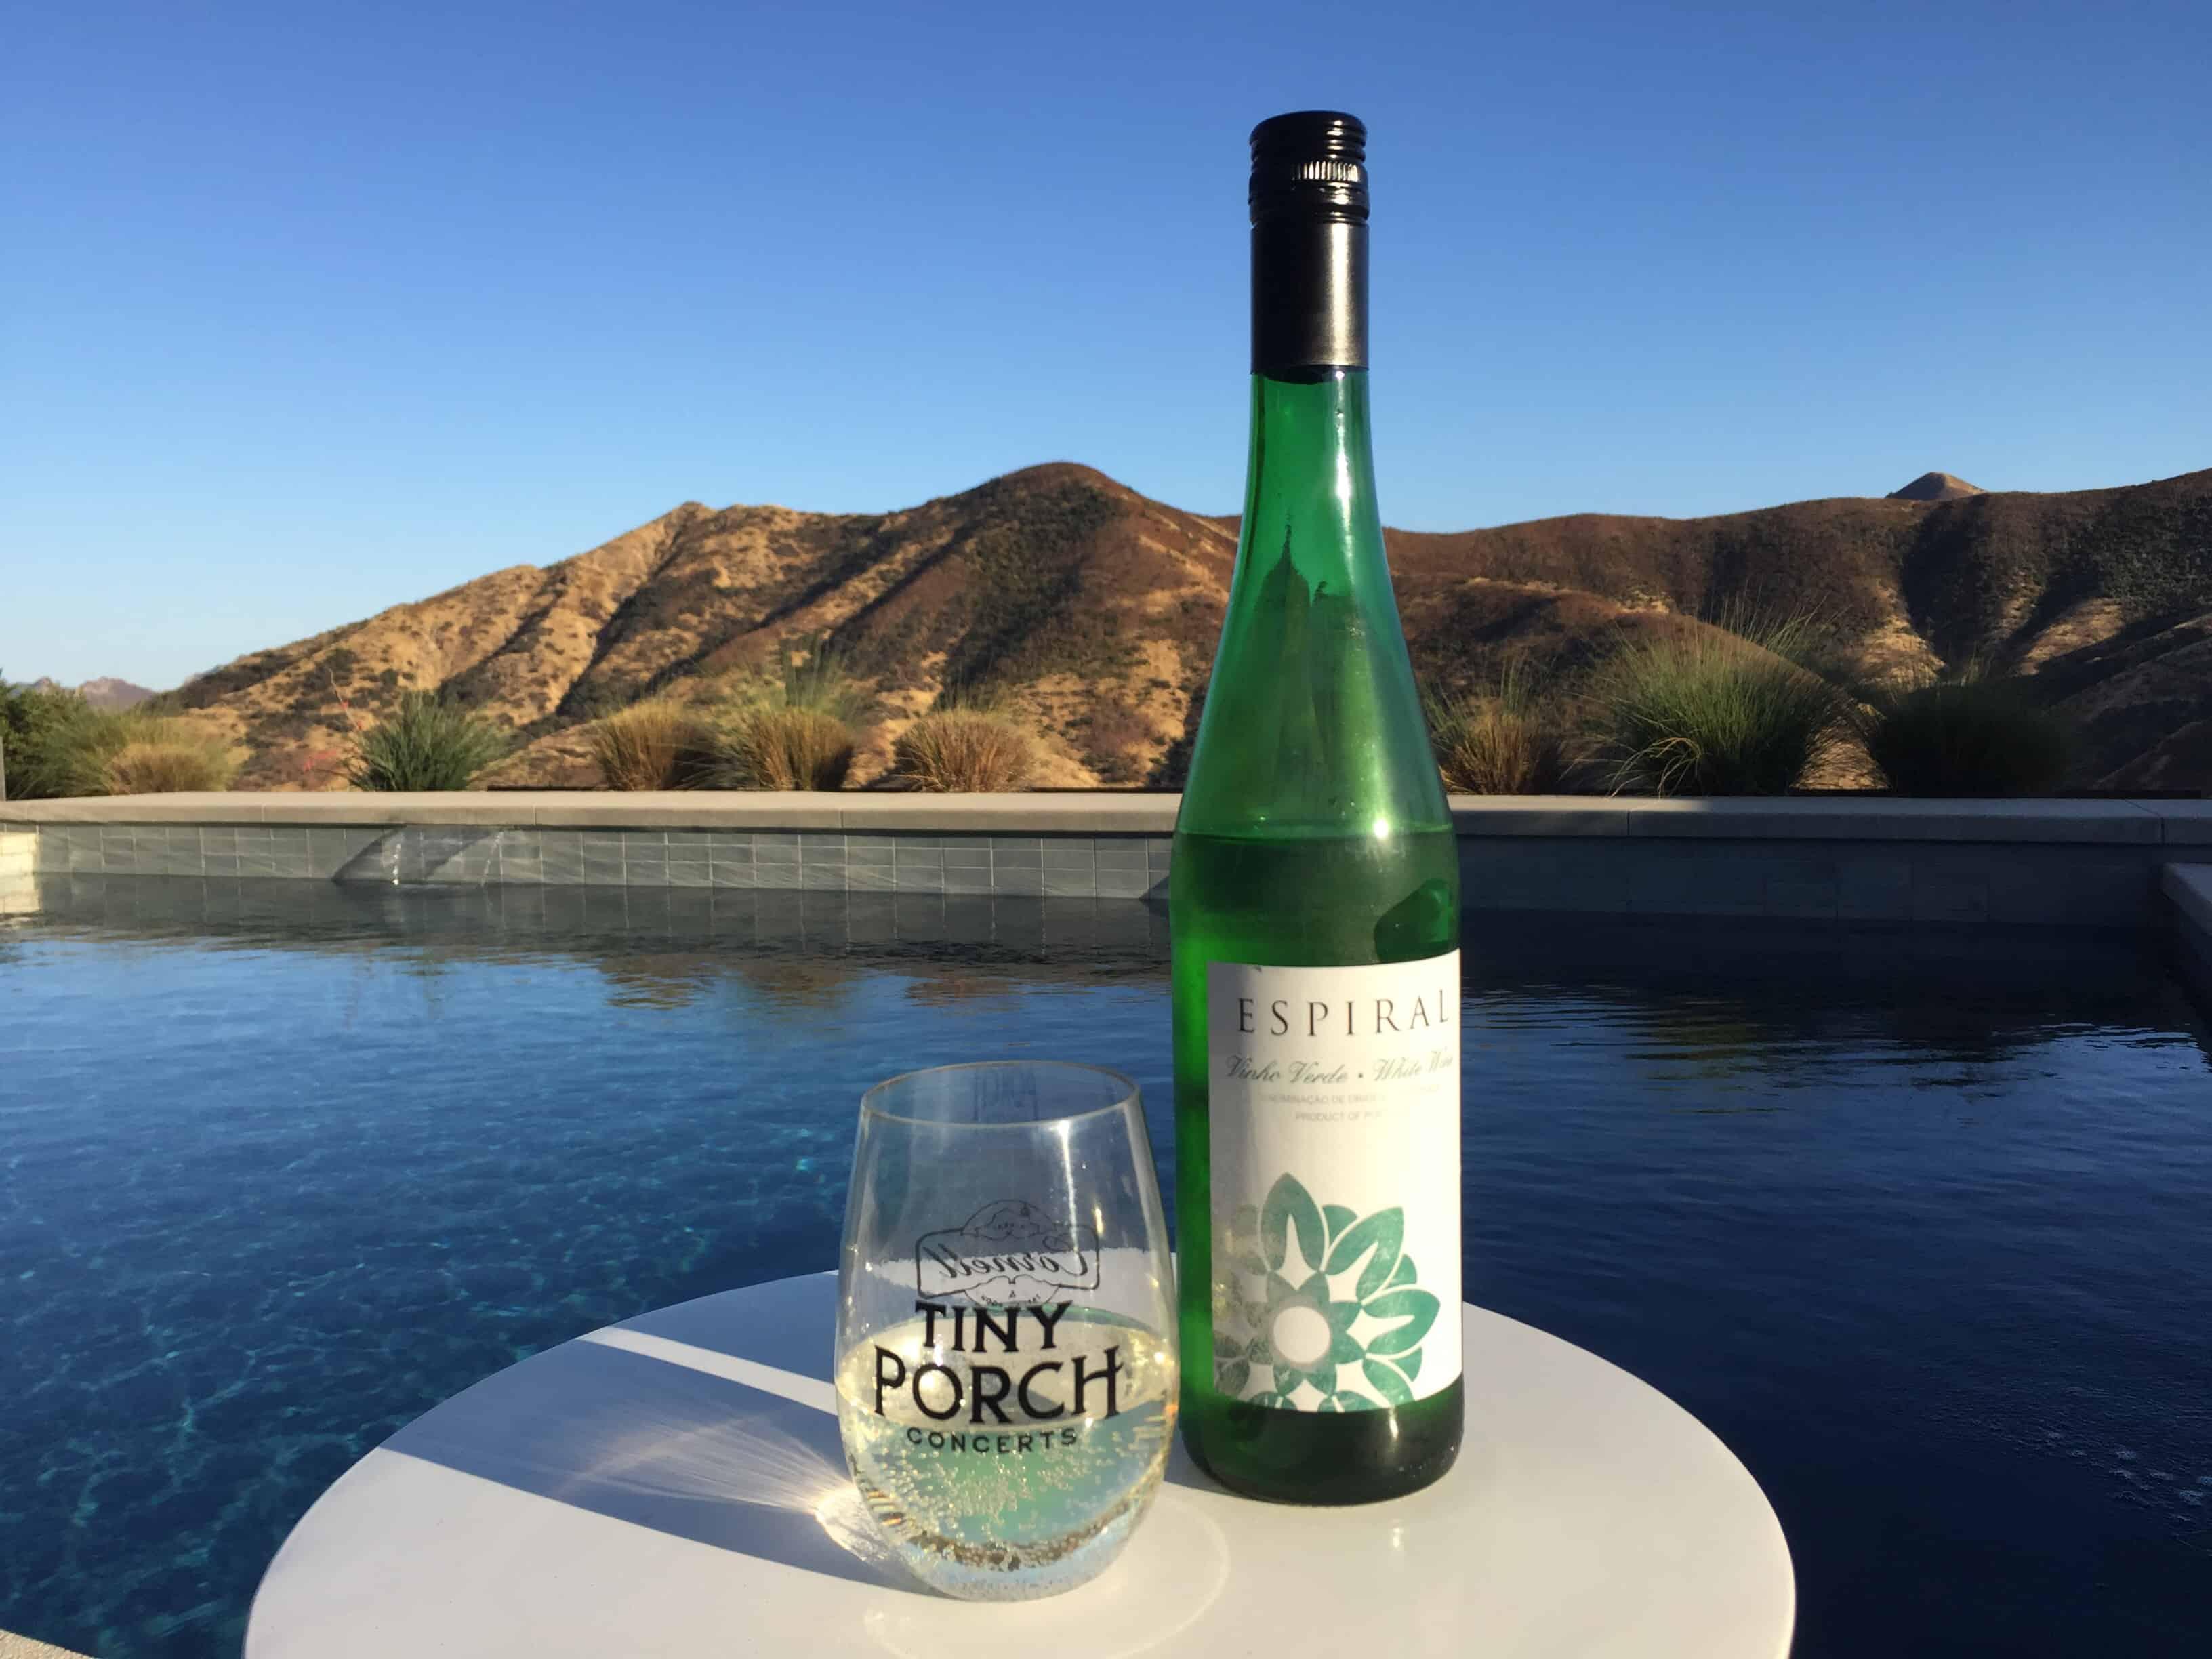 Glass and bottle of Espiral Vinho Verde from Trader Joe's